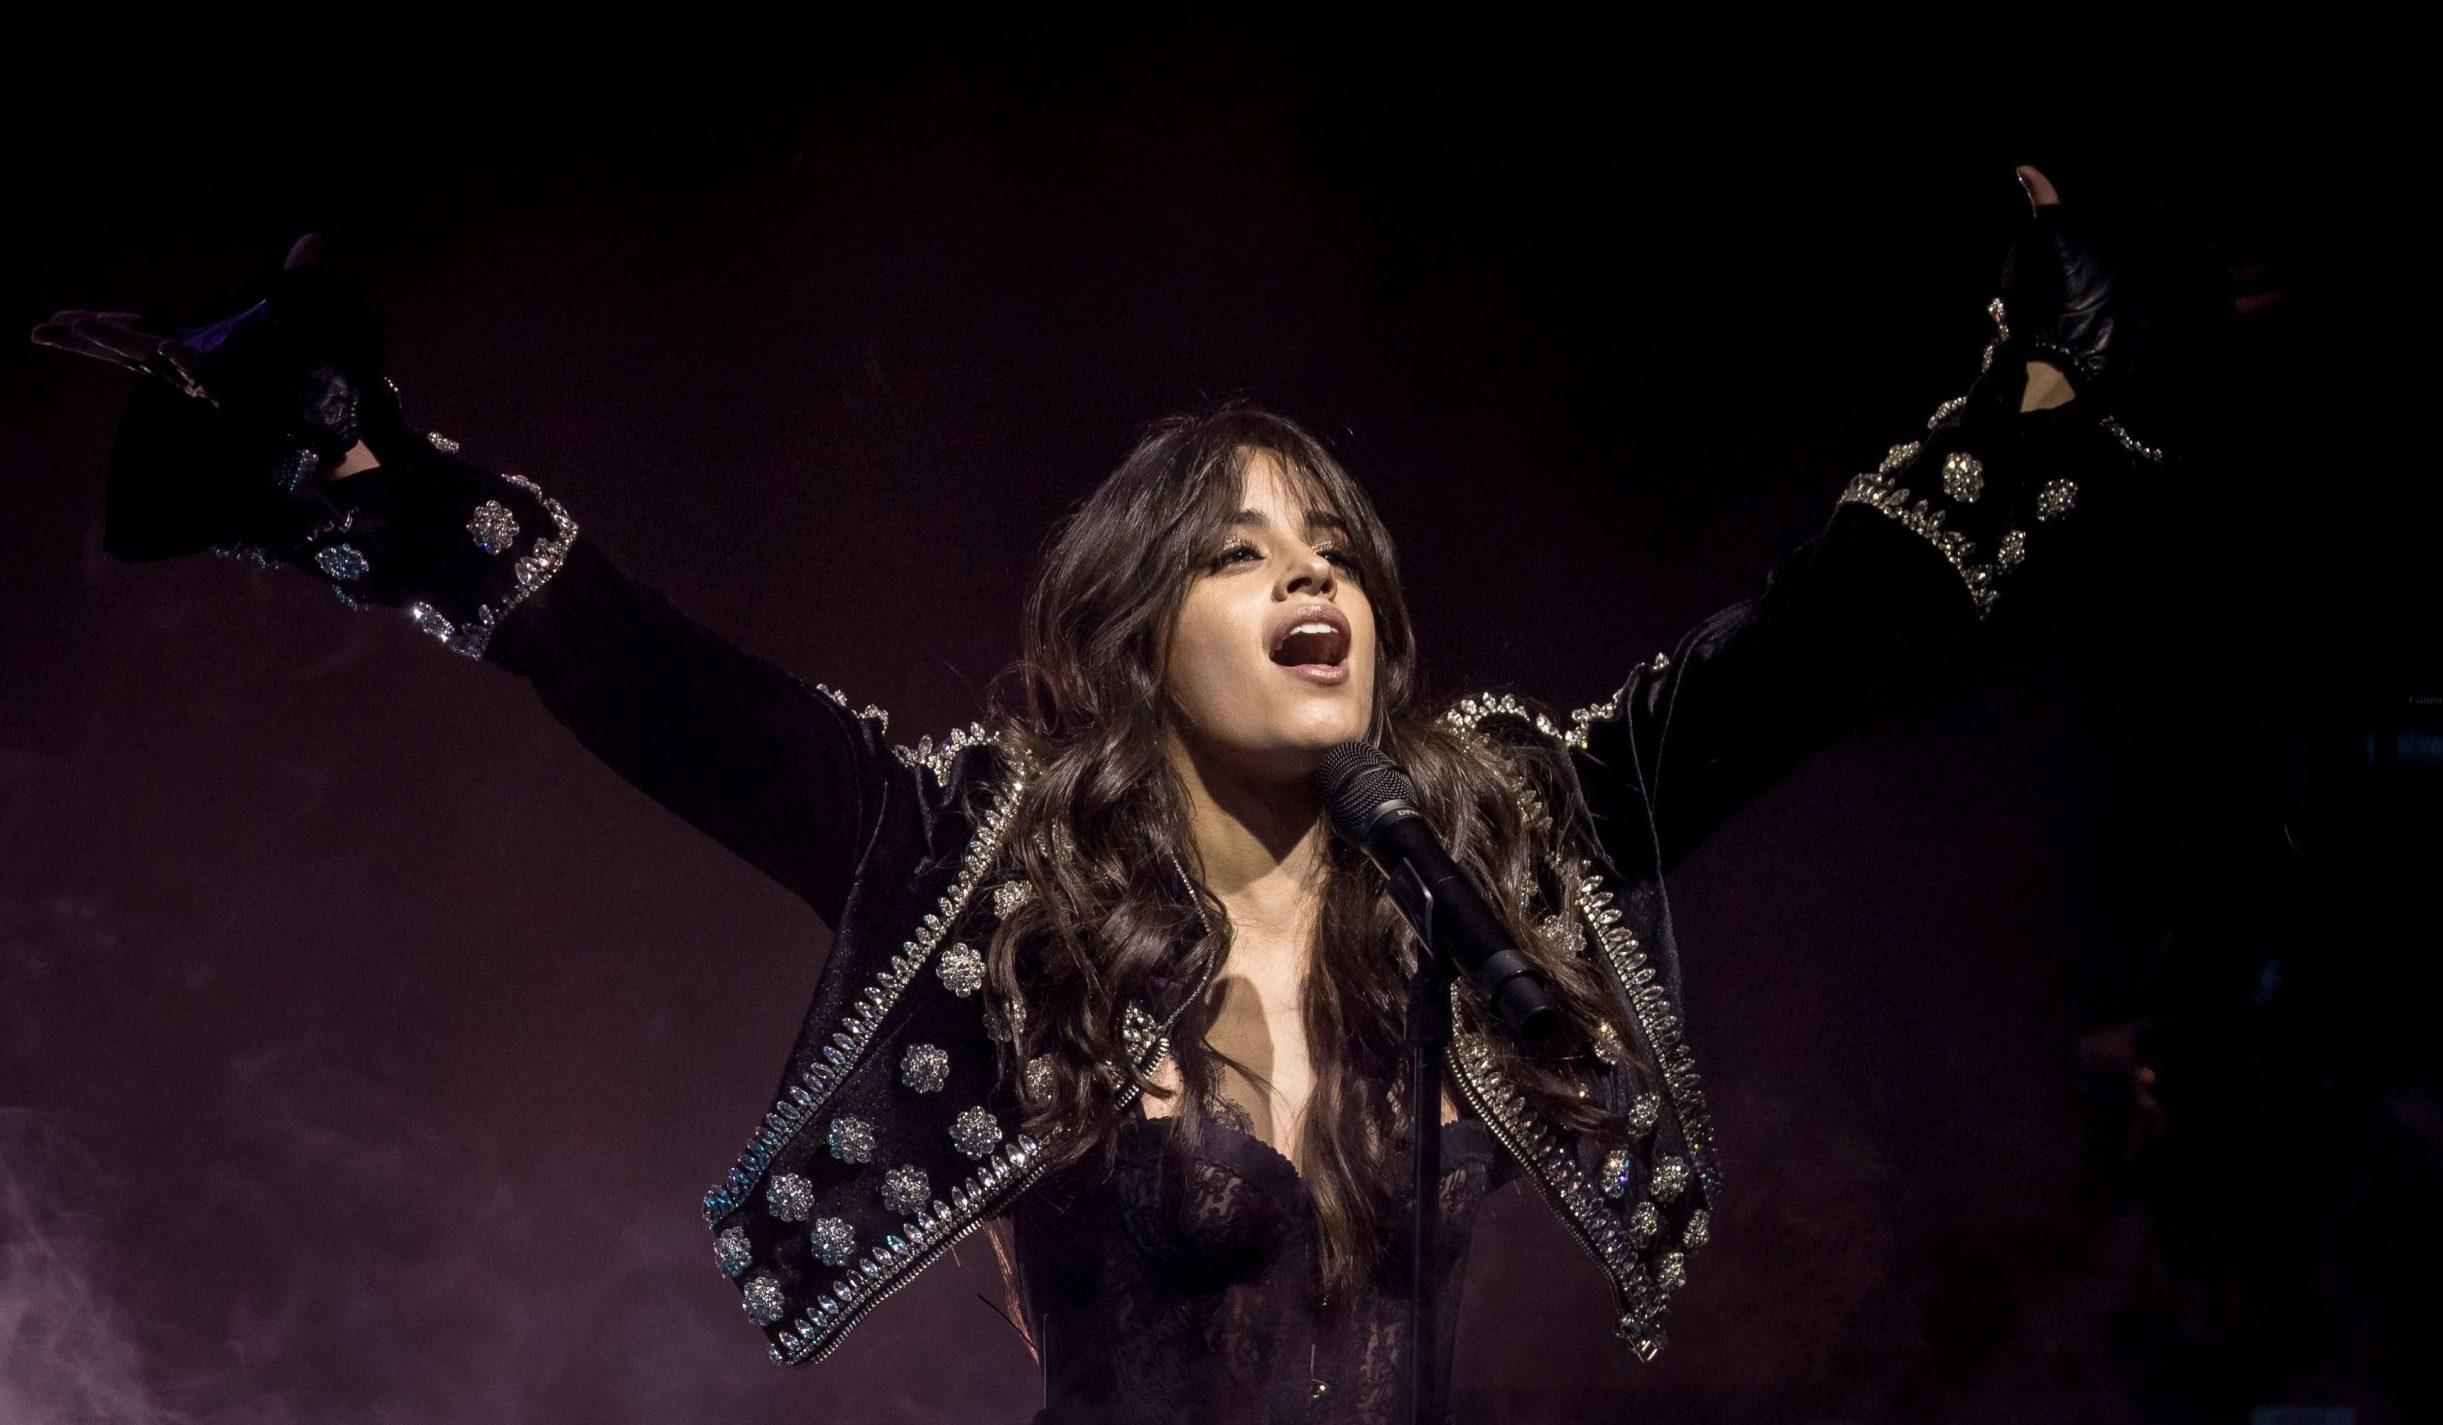 Mandatory Credit: Photo by Tom Dymond/REX/Shutterstock (9714492w) Camila Cabello Camila Cabello in concert at O2 Academy Brixton, London, UK - 12 Jun 2018